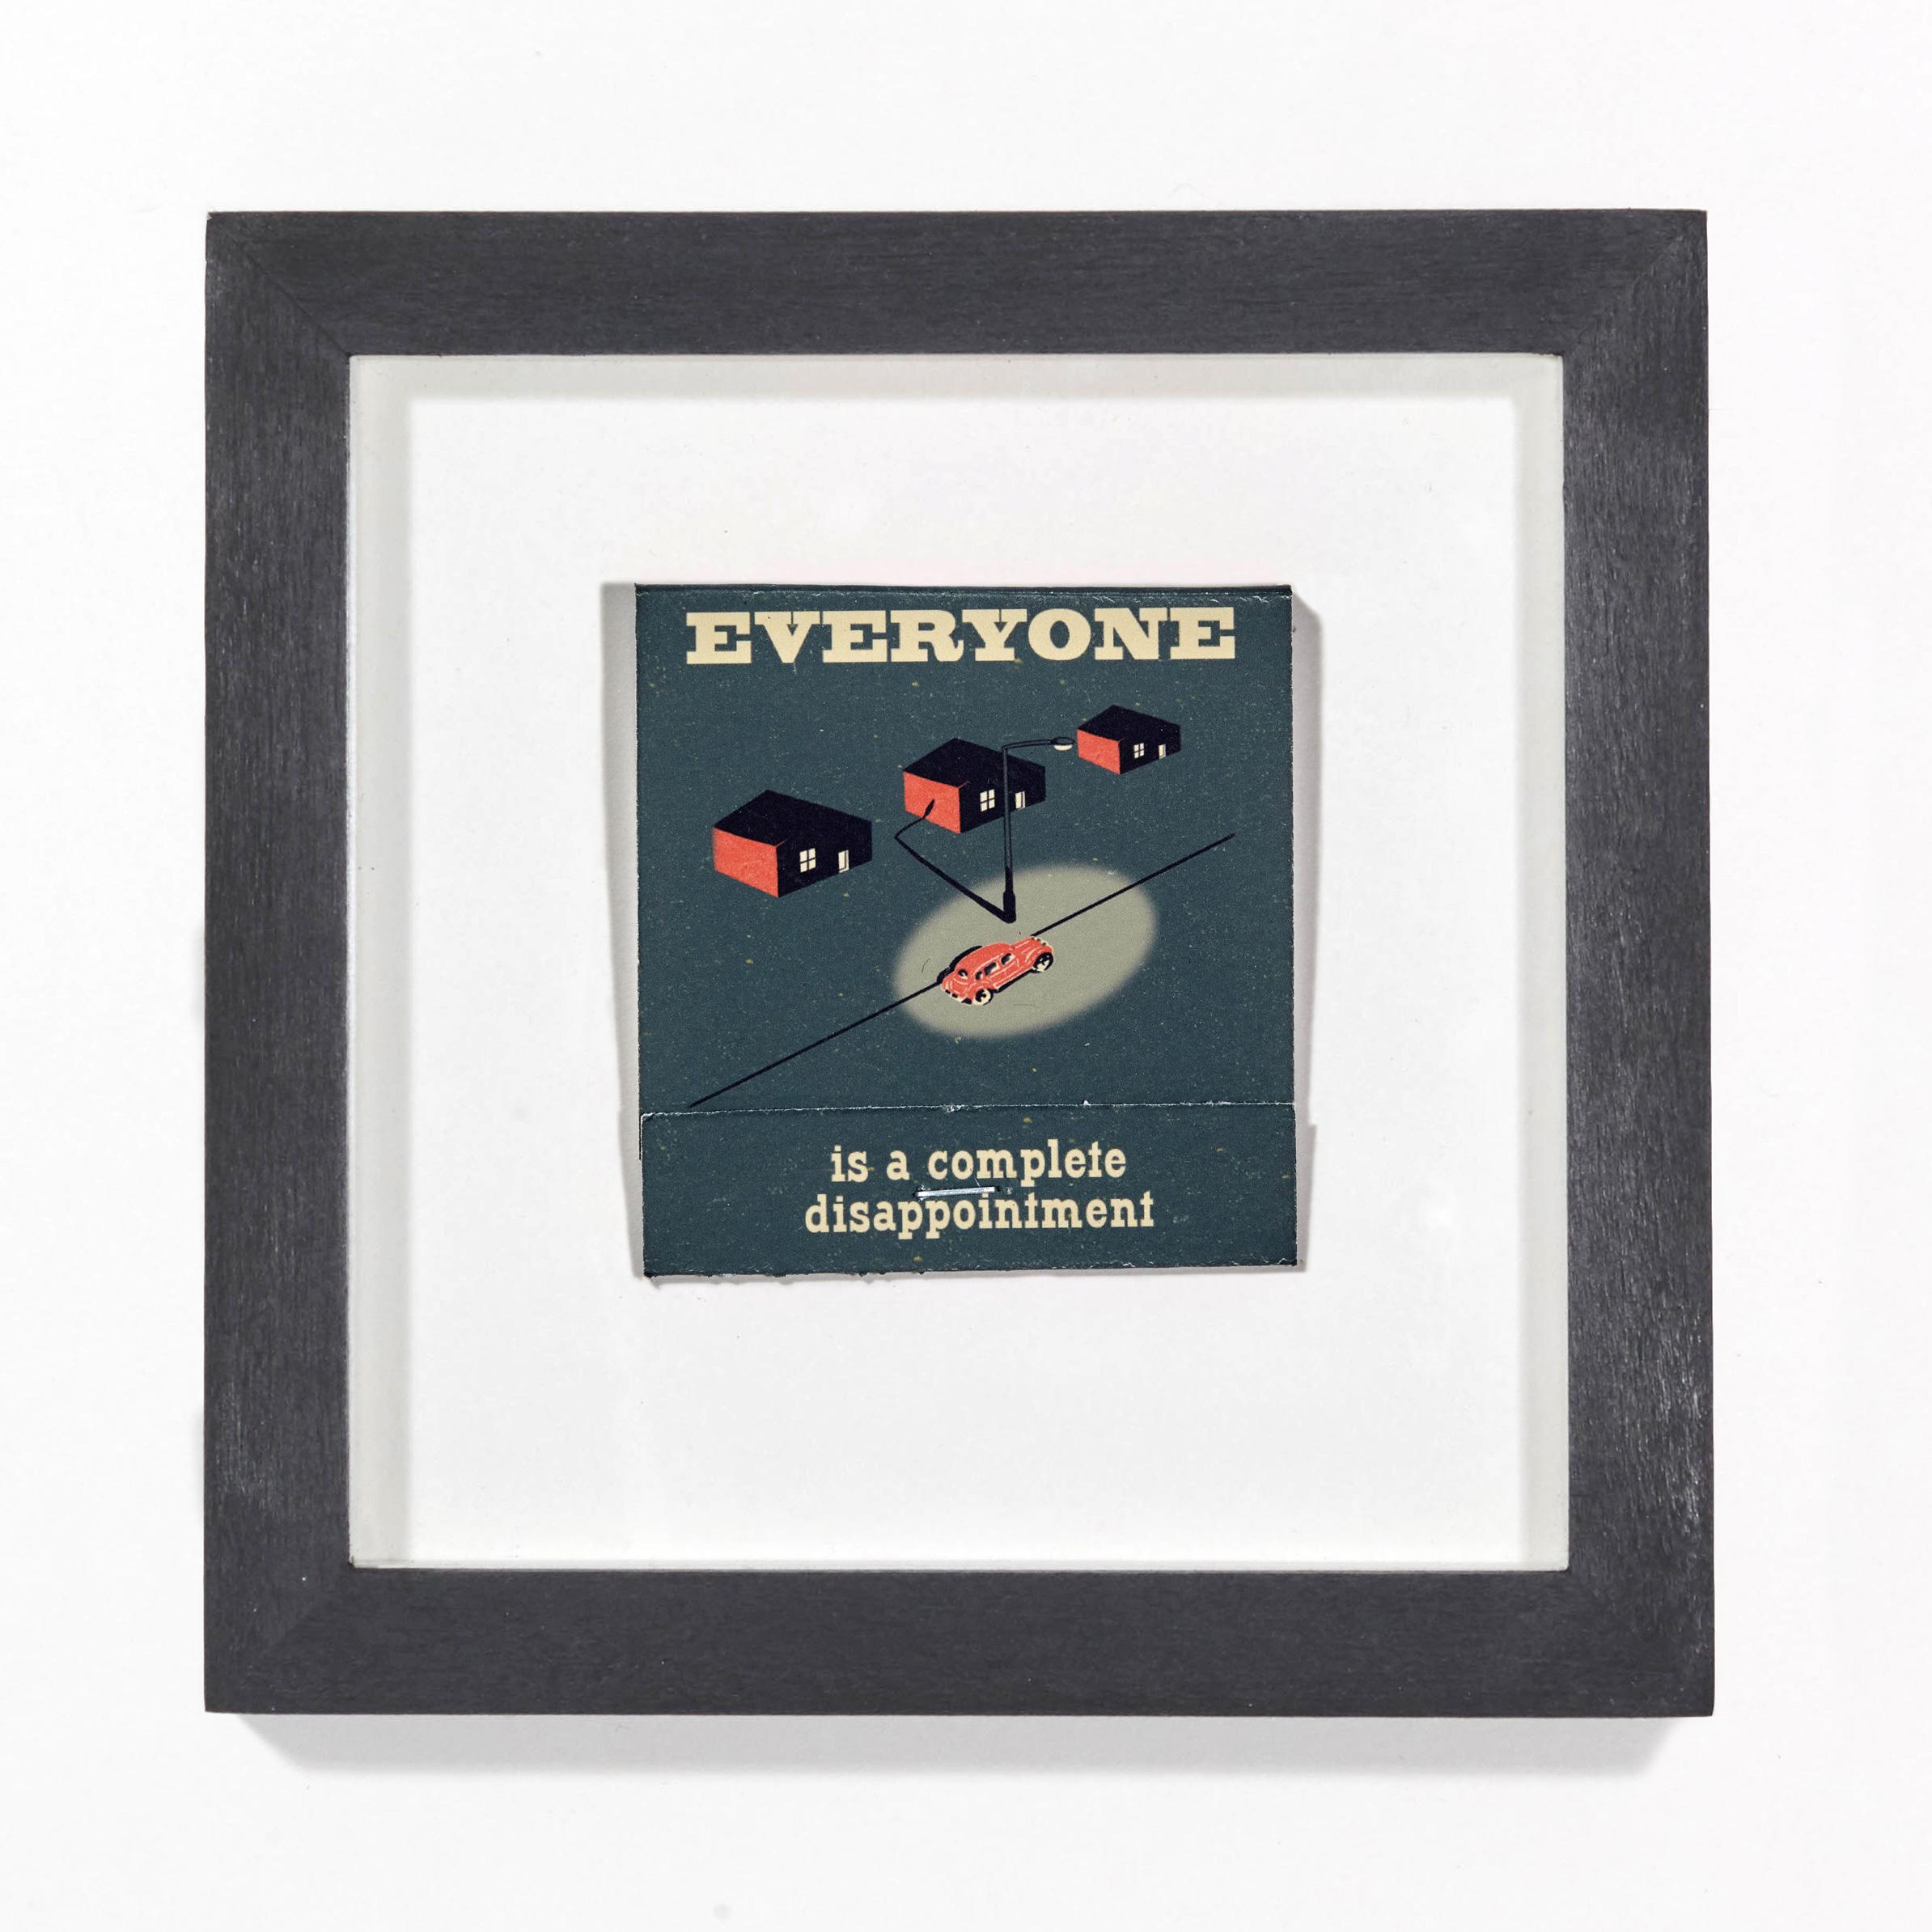 Unfound Object XXI (Everyone)